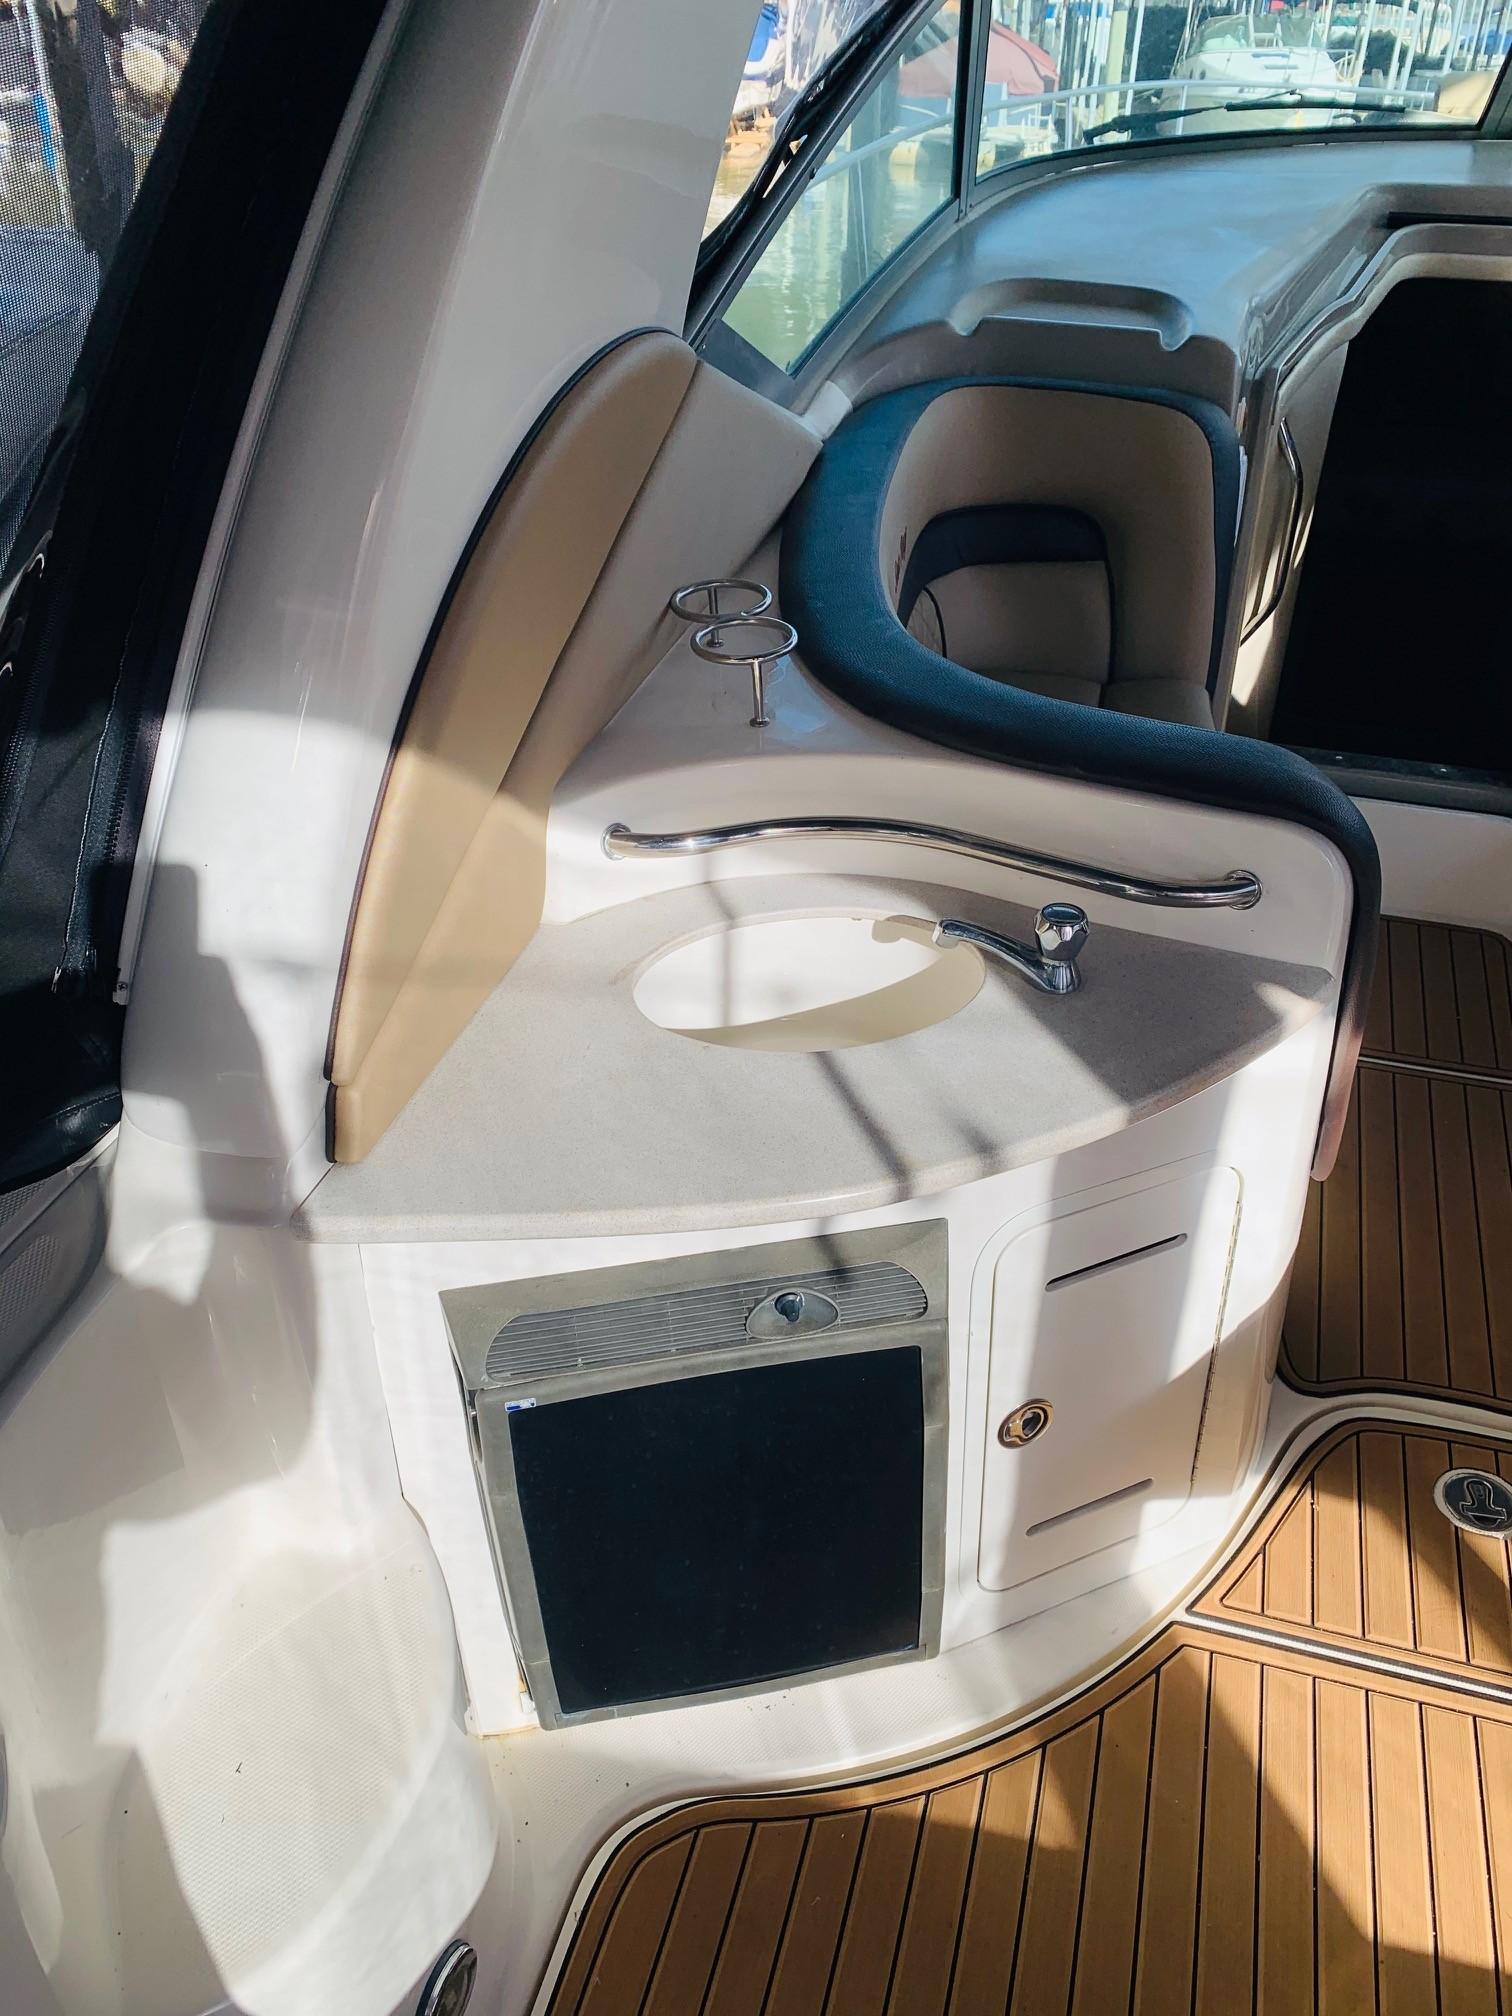 Sea Ray 320 Sundancer - Cockpit Sink